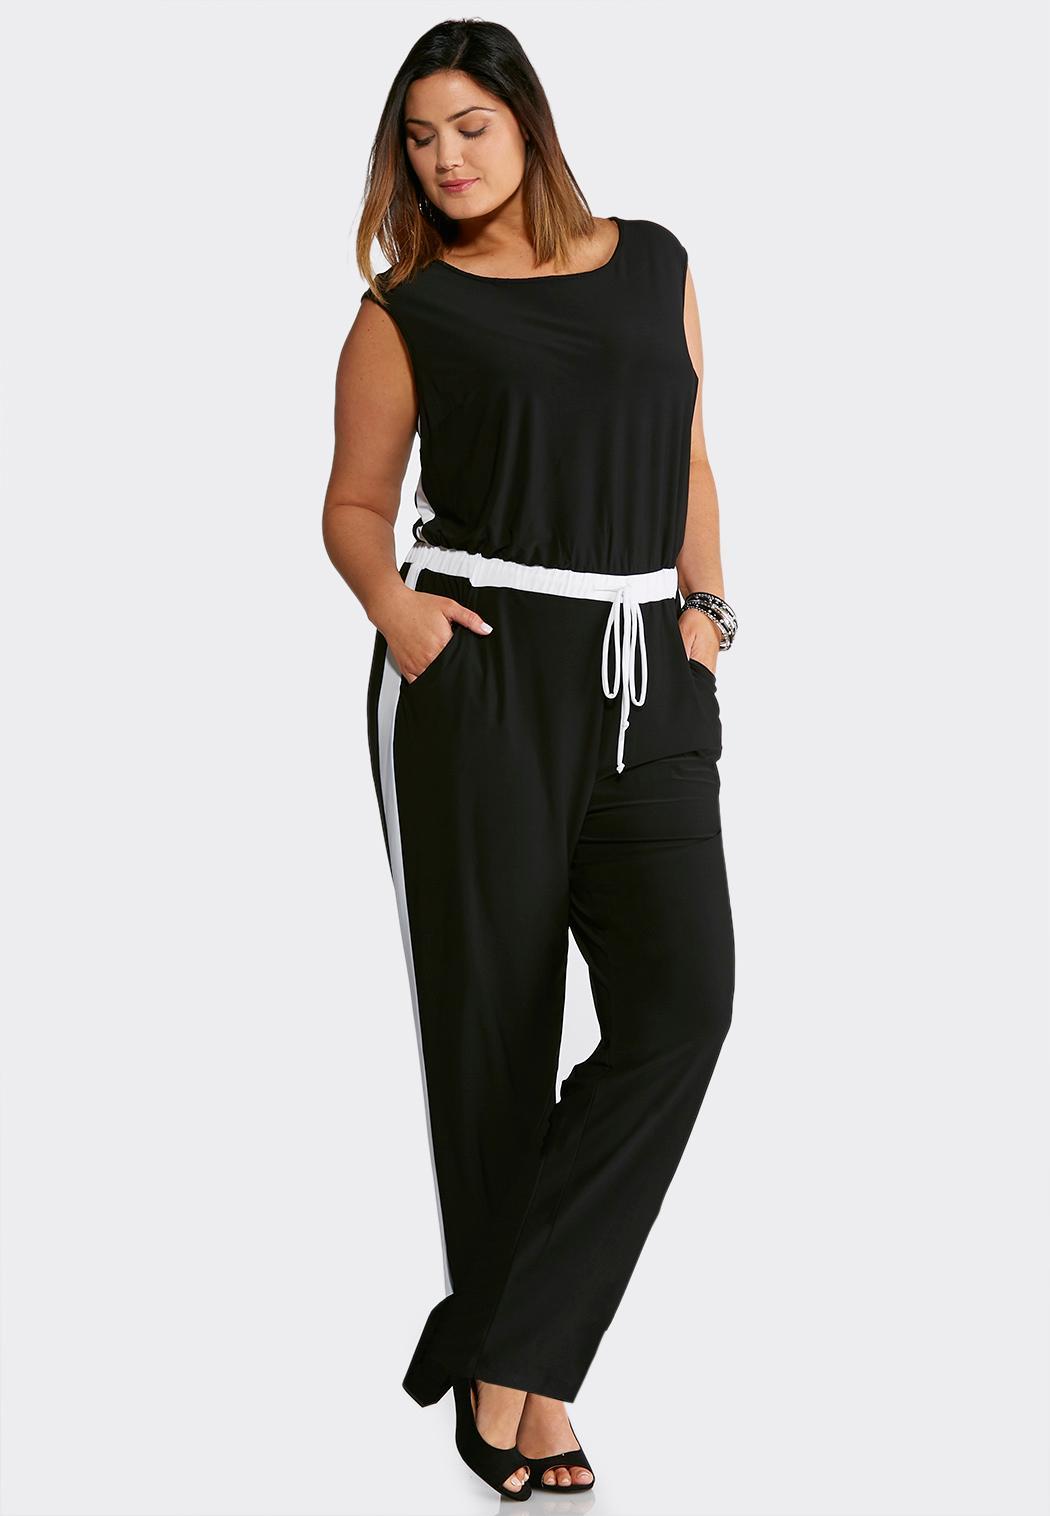 Plus Size Black And White Tie Waist Jumpsuit Dresses Cato Fashions